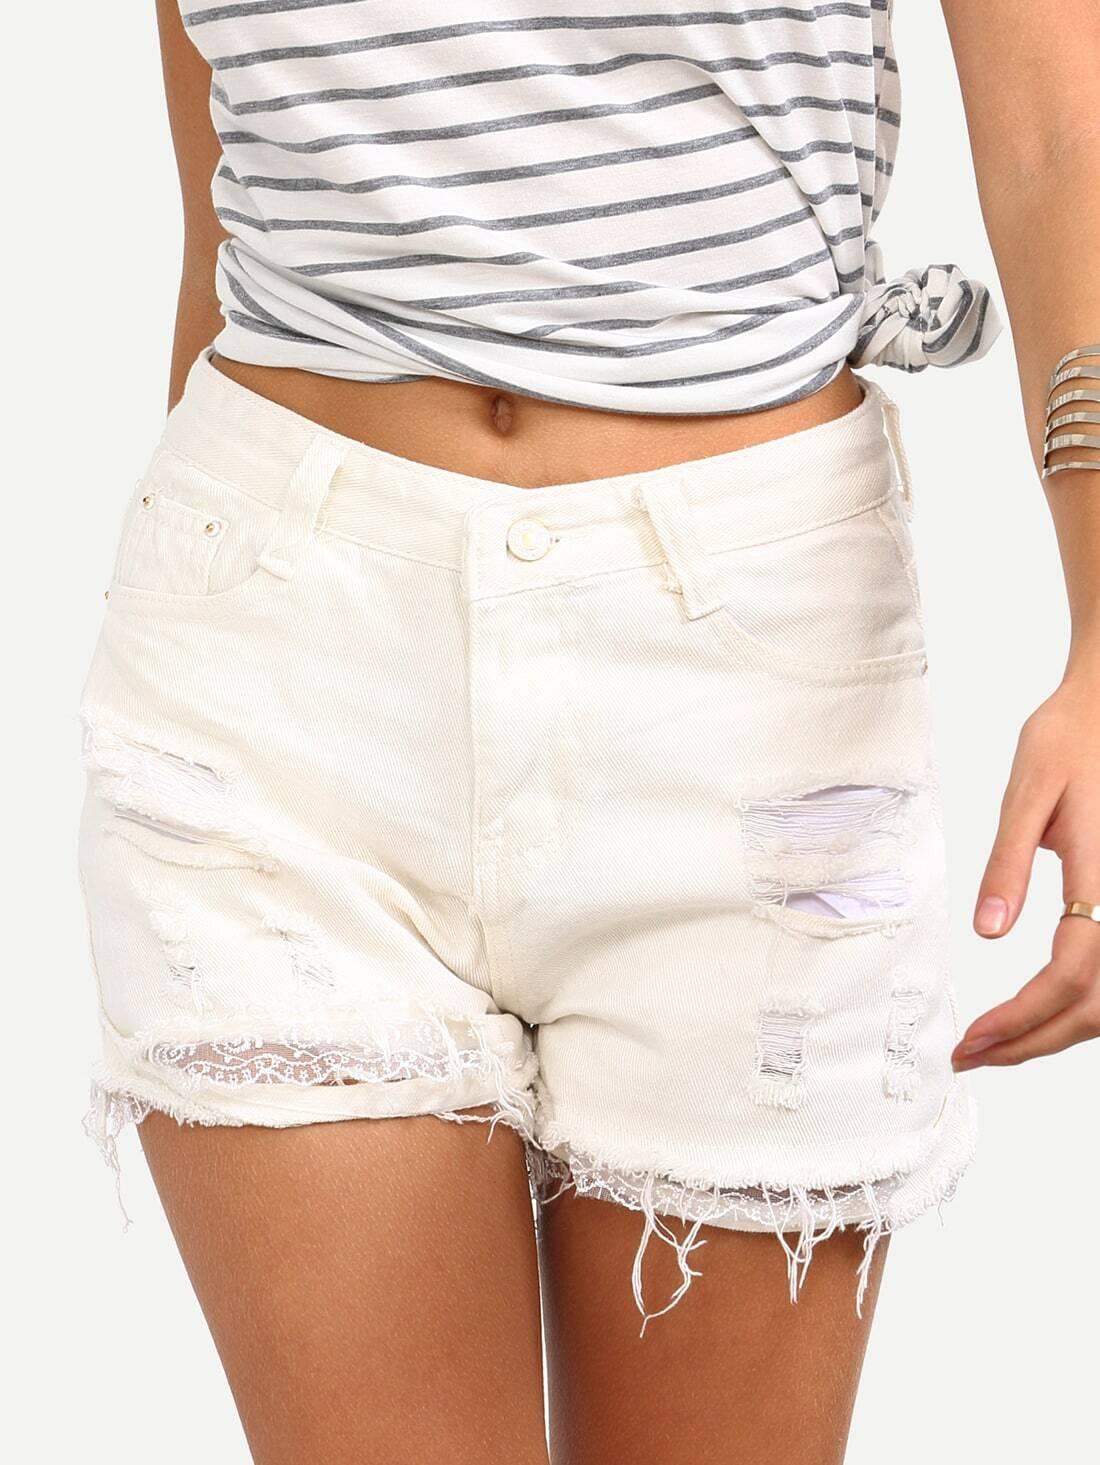 Ripped Lace Trimmed White Denim Shorts -SheIn(Sheinside)